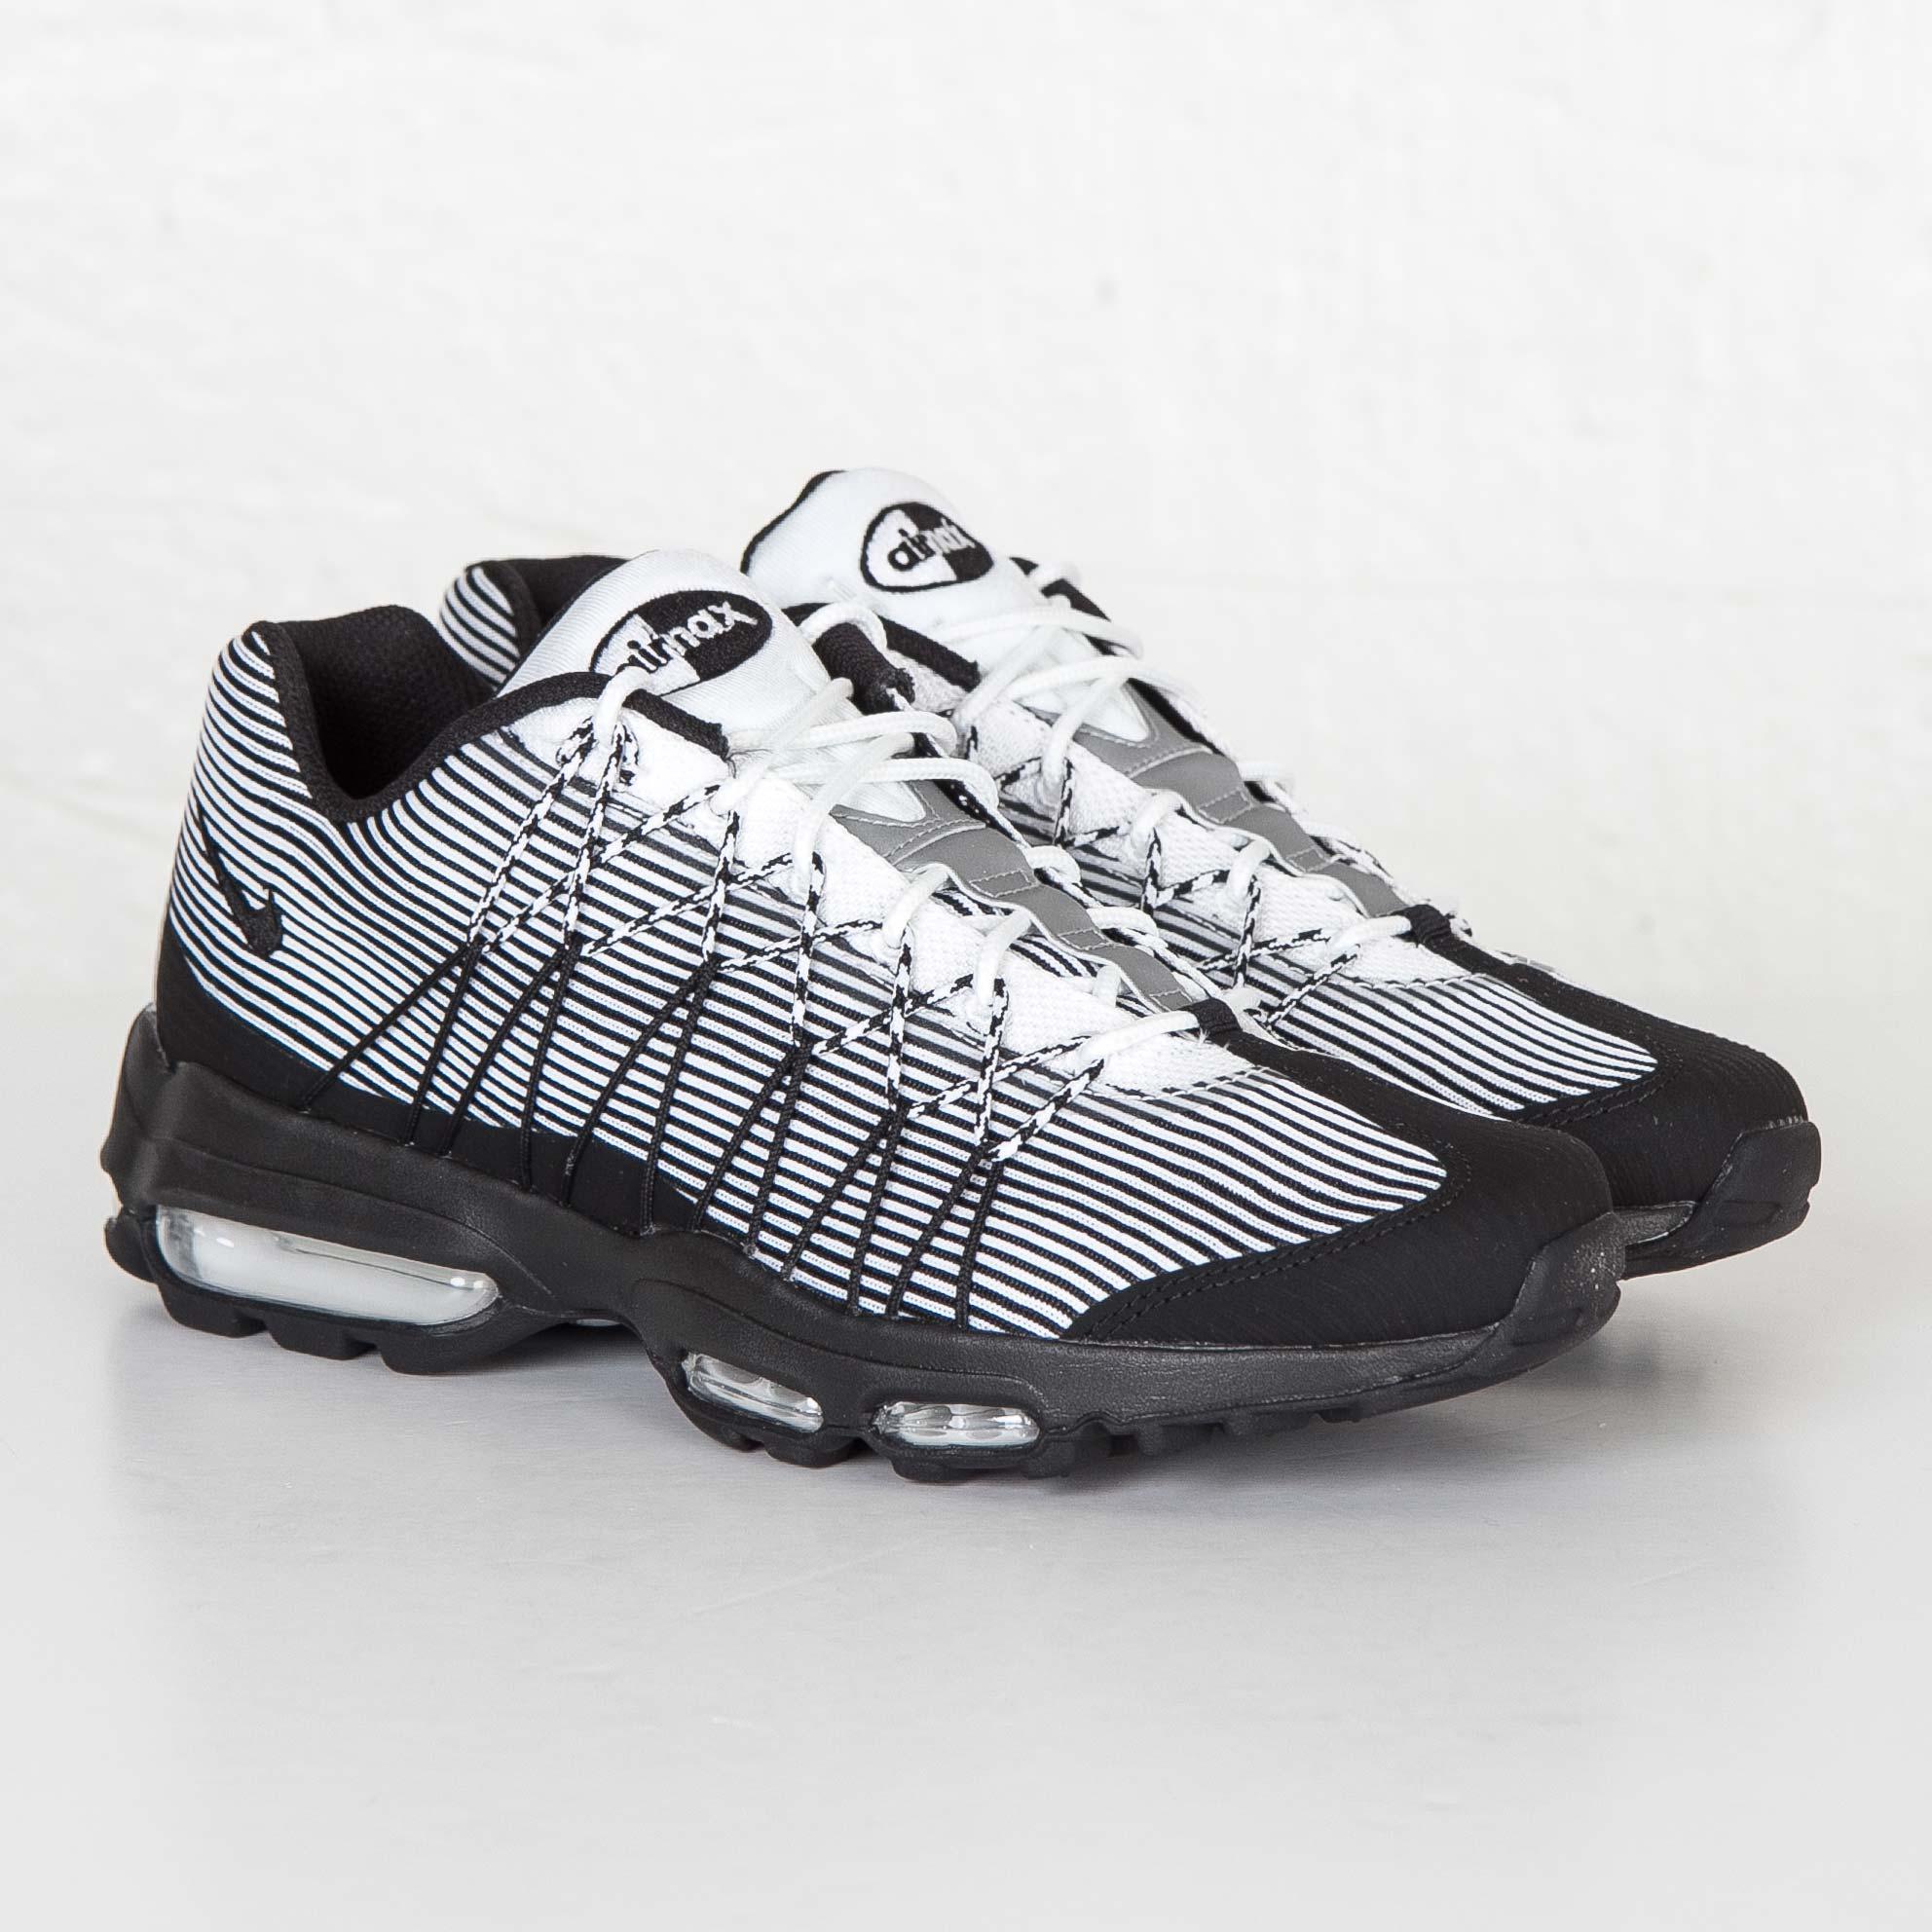 Nike Air Max 95 Ultra Jacquard - 749771-101 - SNS | sneakers ...